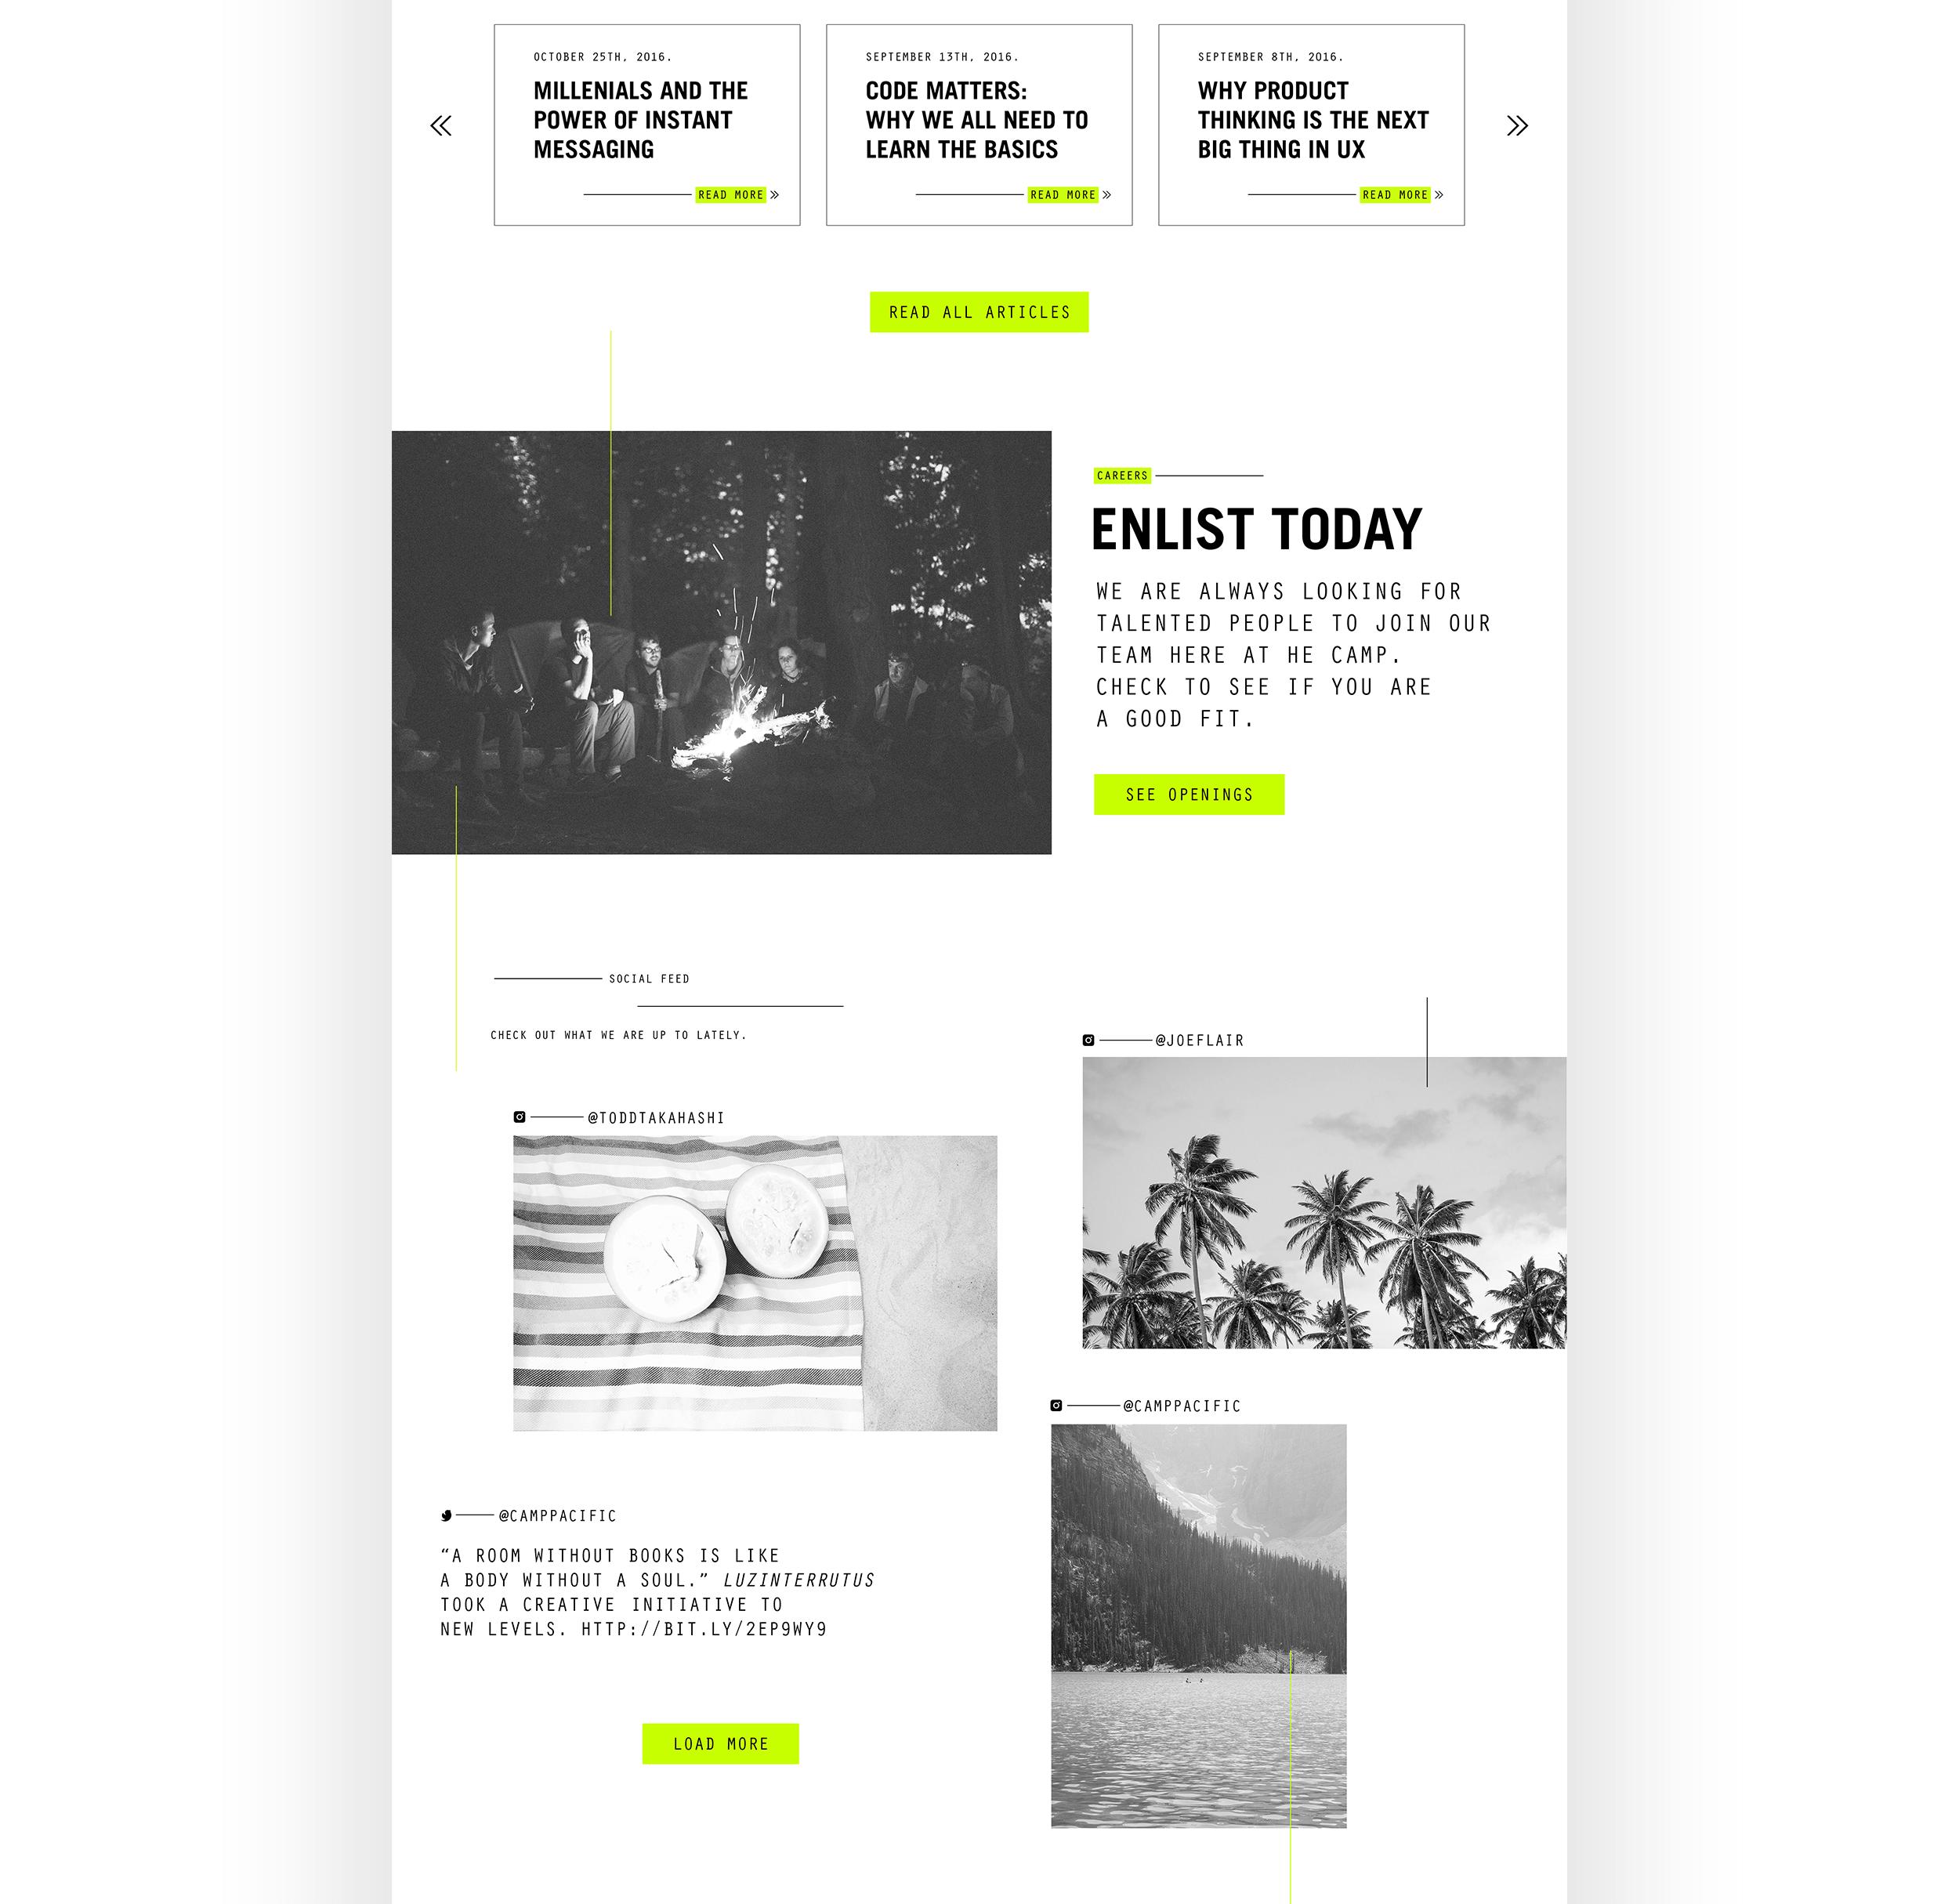 007-CampNewSite-Image-06